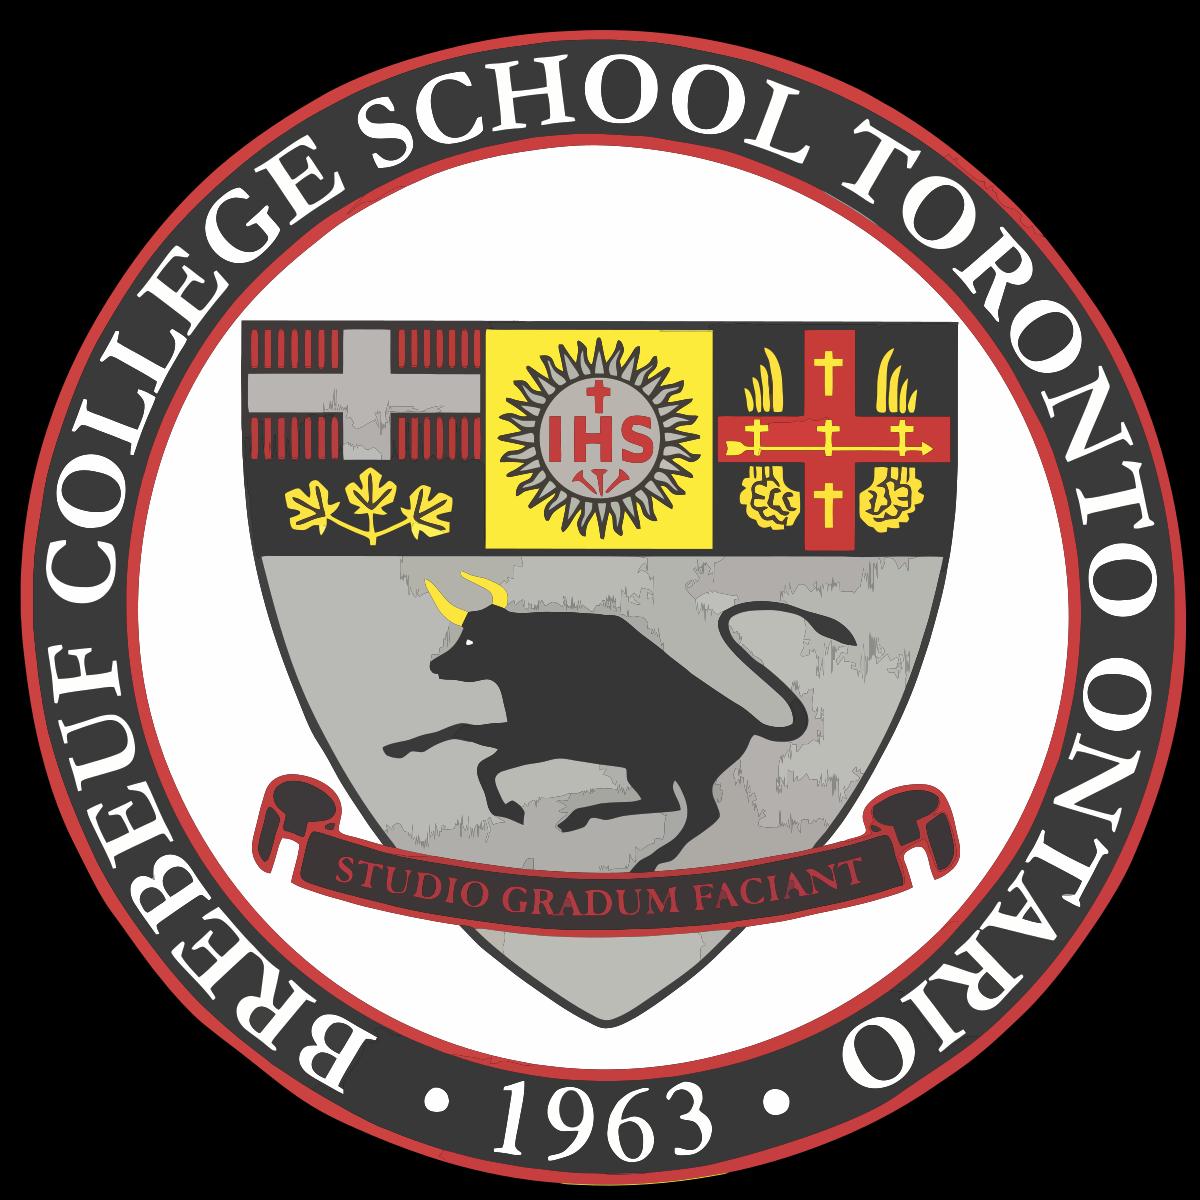 school logo - Brad Ryan